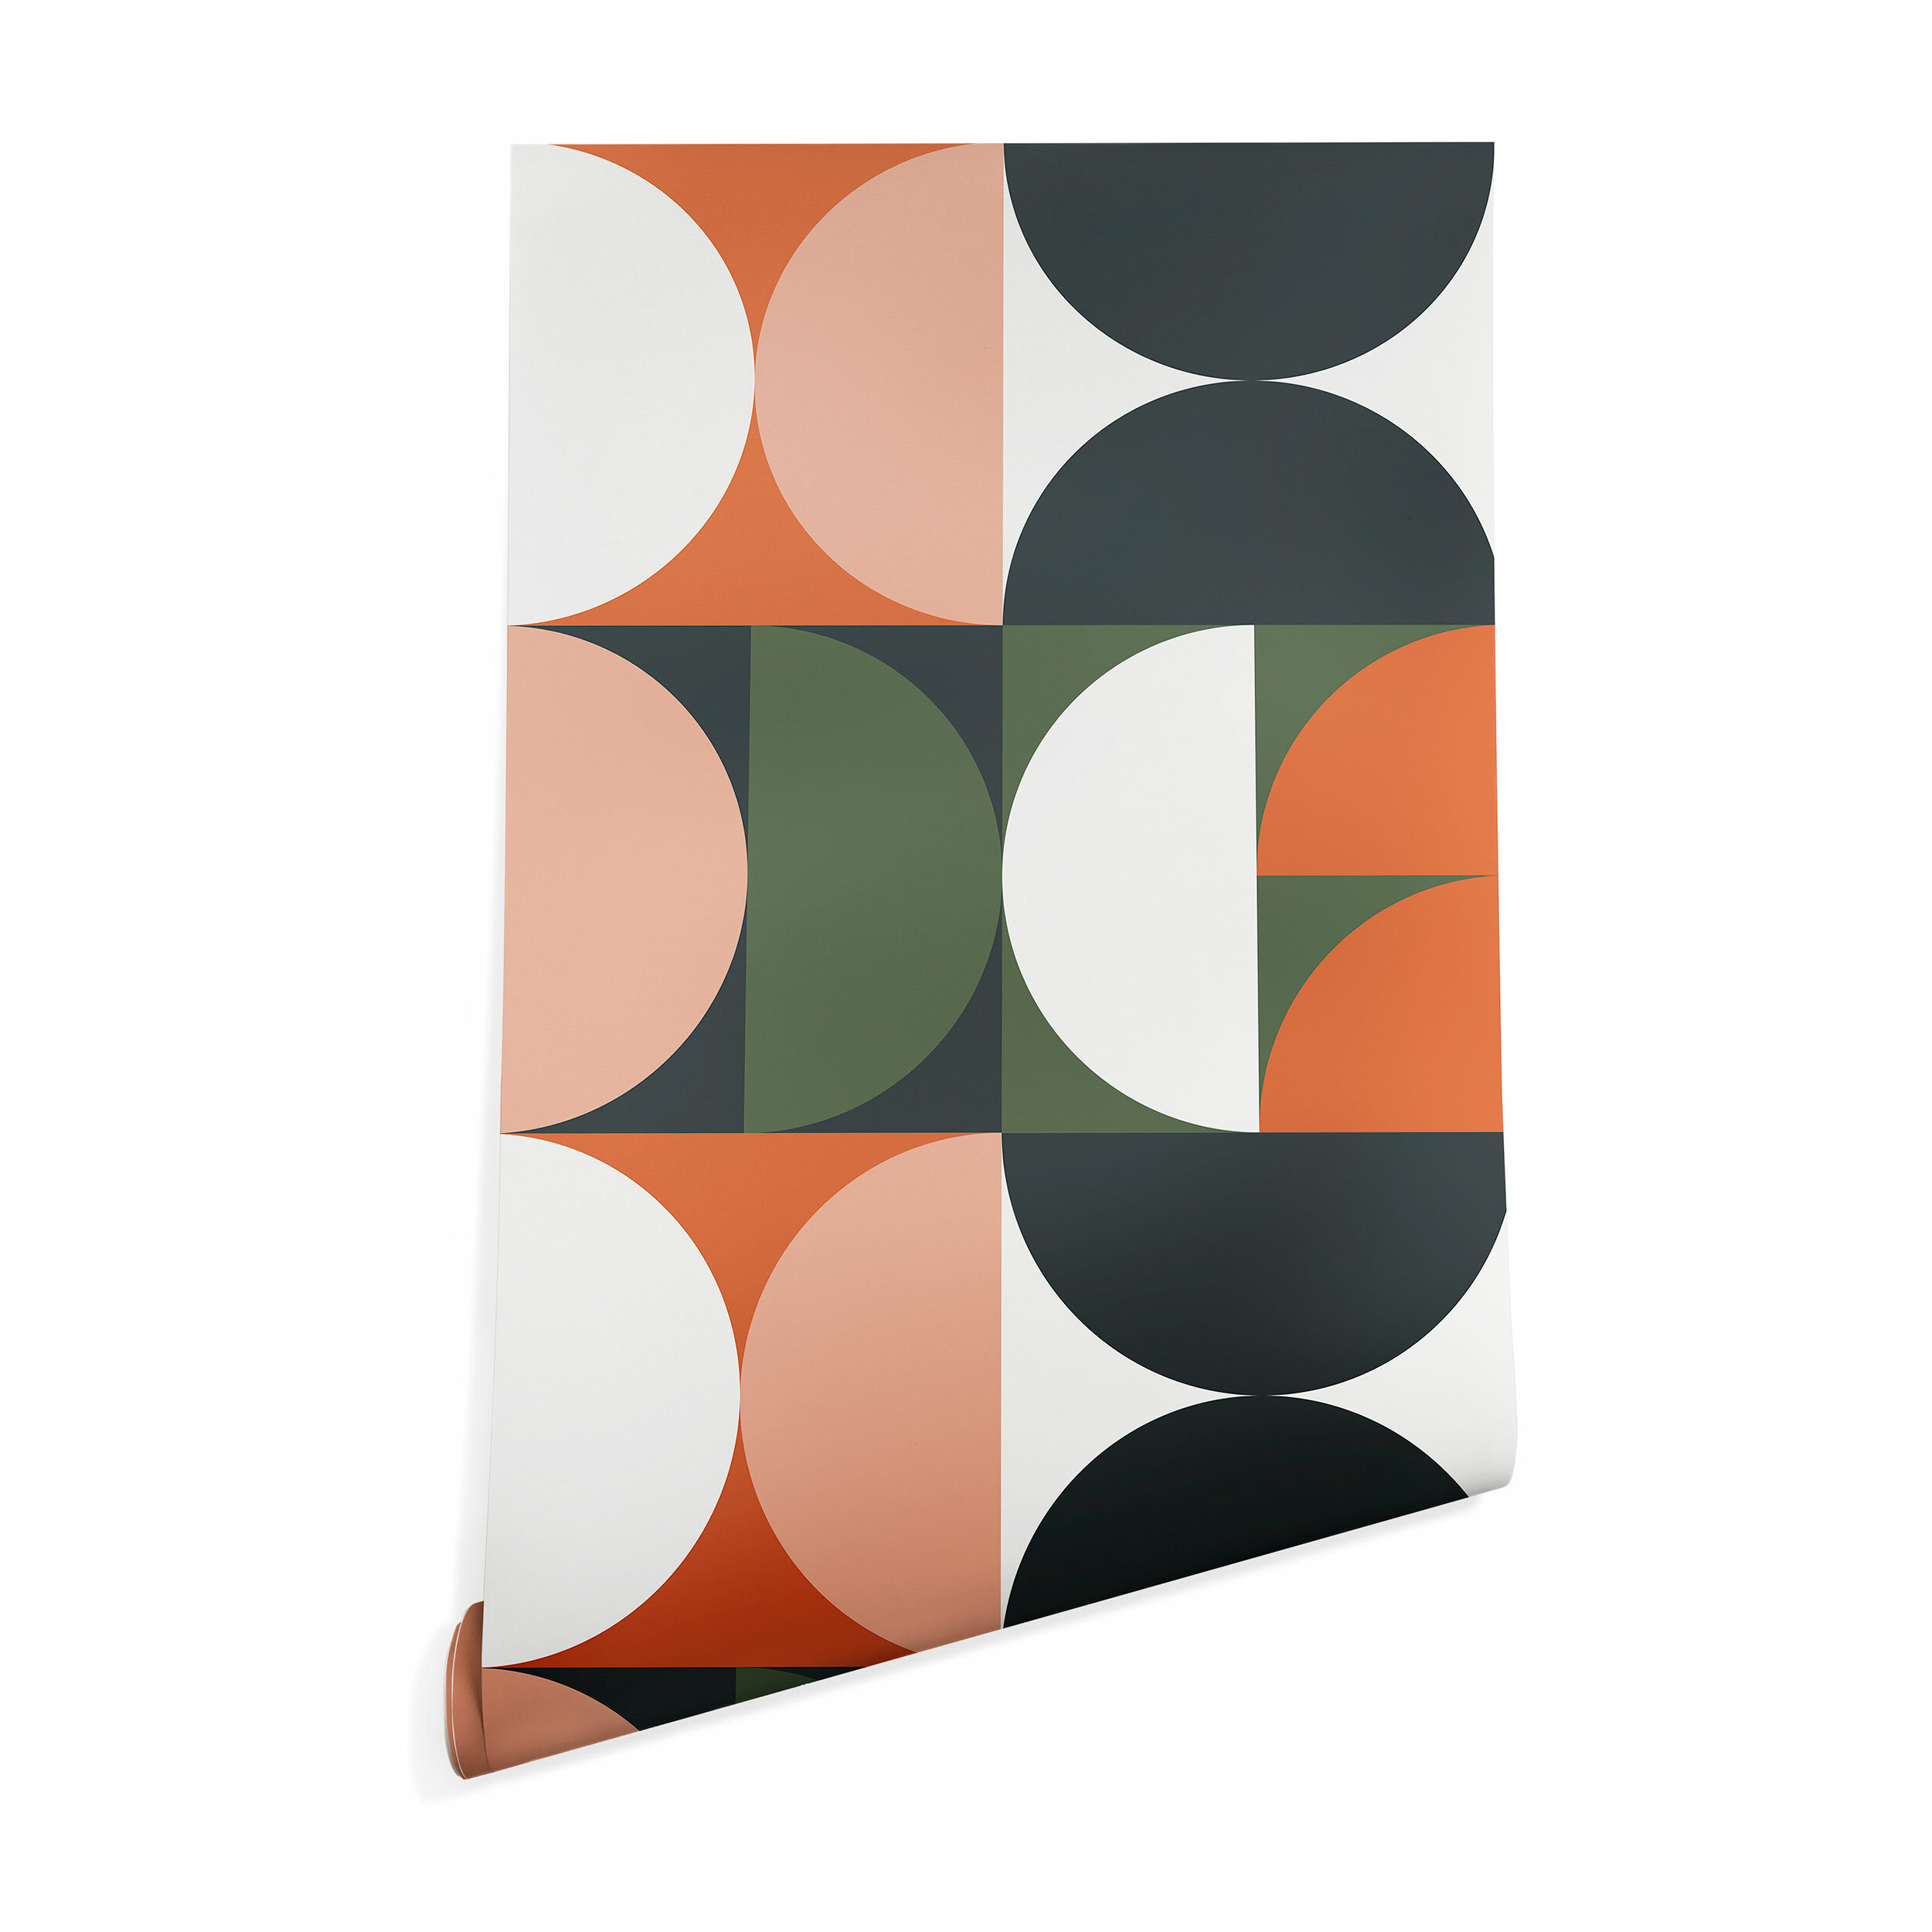 Mid Century Modern Self Adhesive Wallpaper You Ll Love In 2020 Wayfair